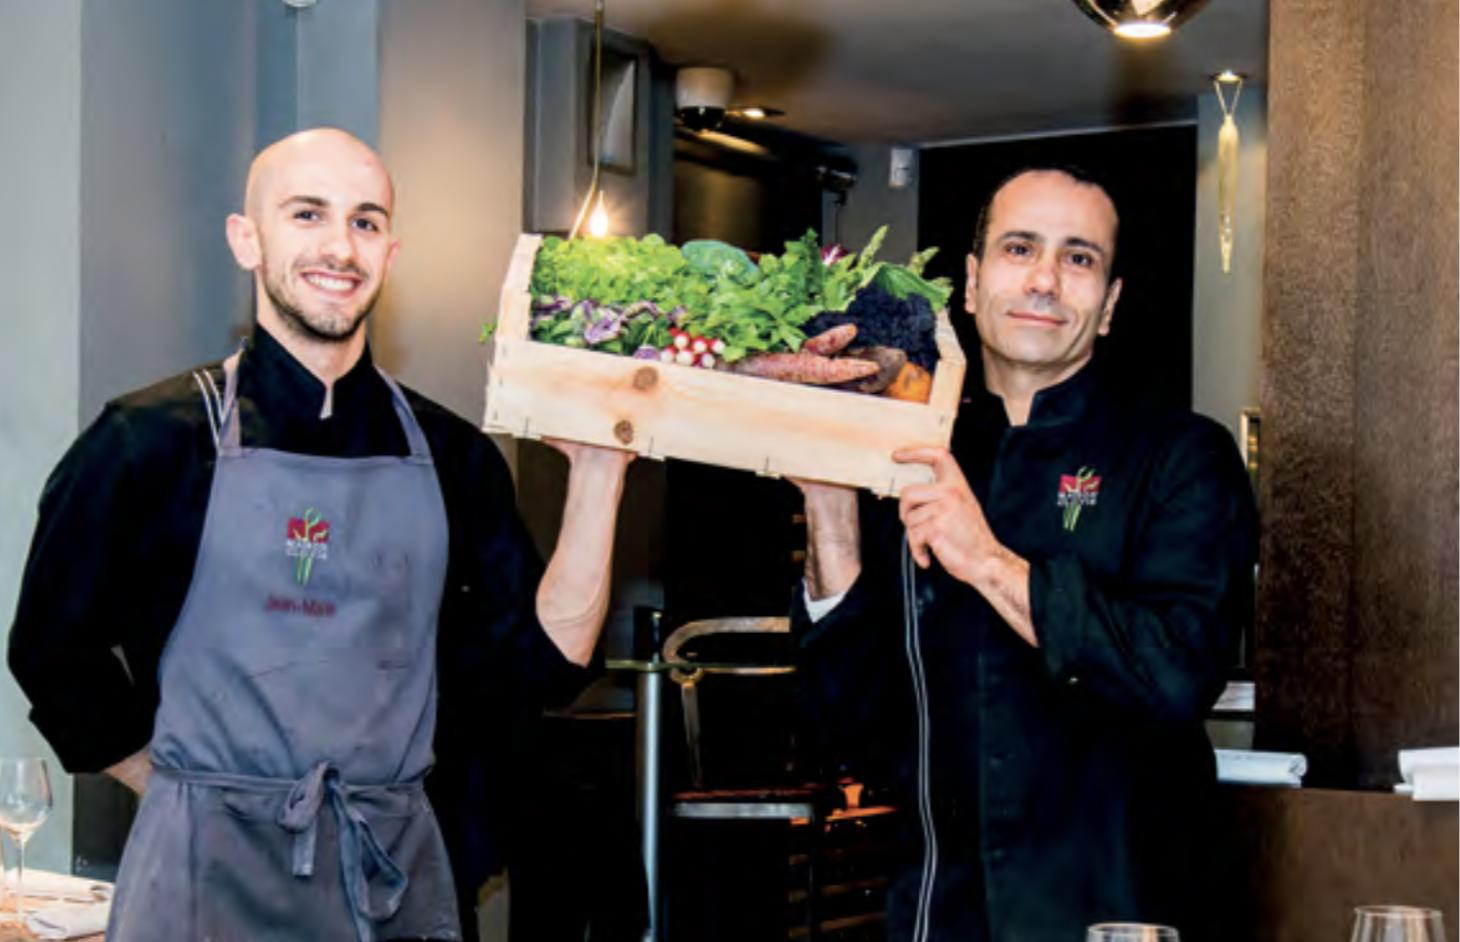 Restaurant Maison Clovis - Clovis Khoury